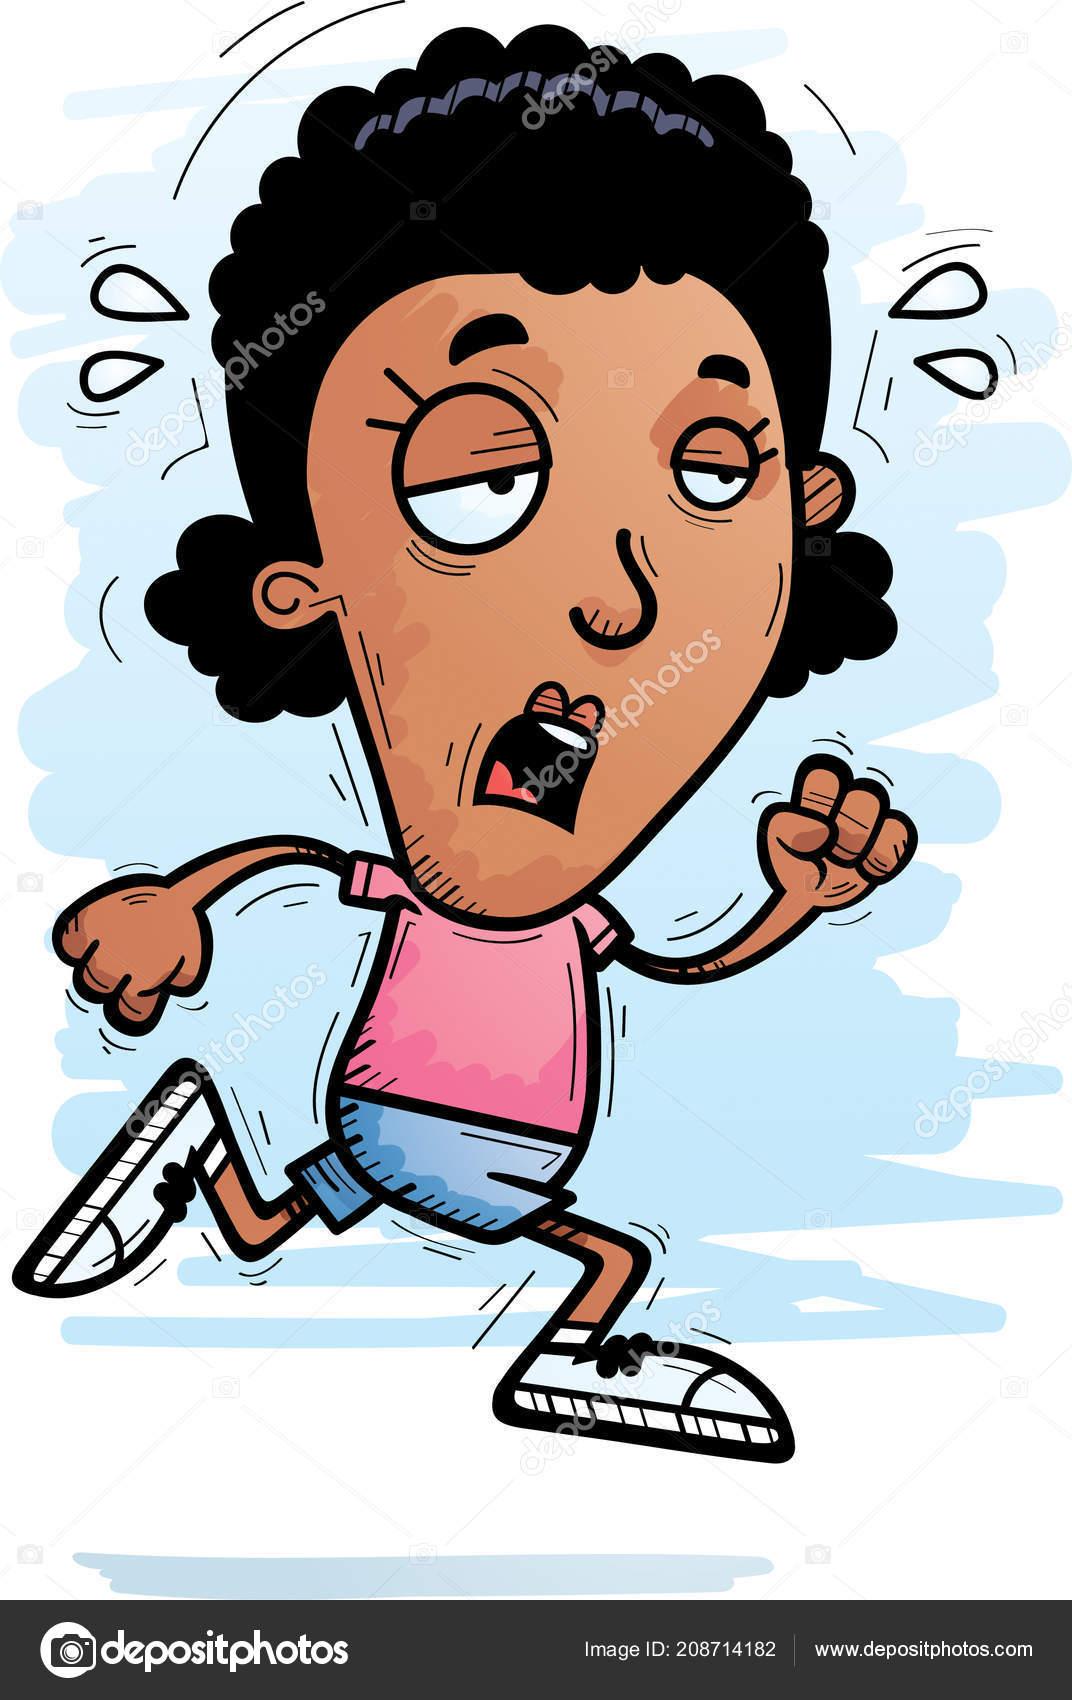 cartoon illustration black woman running looking exhausted